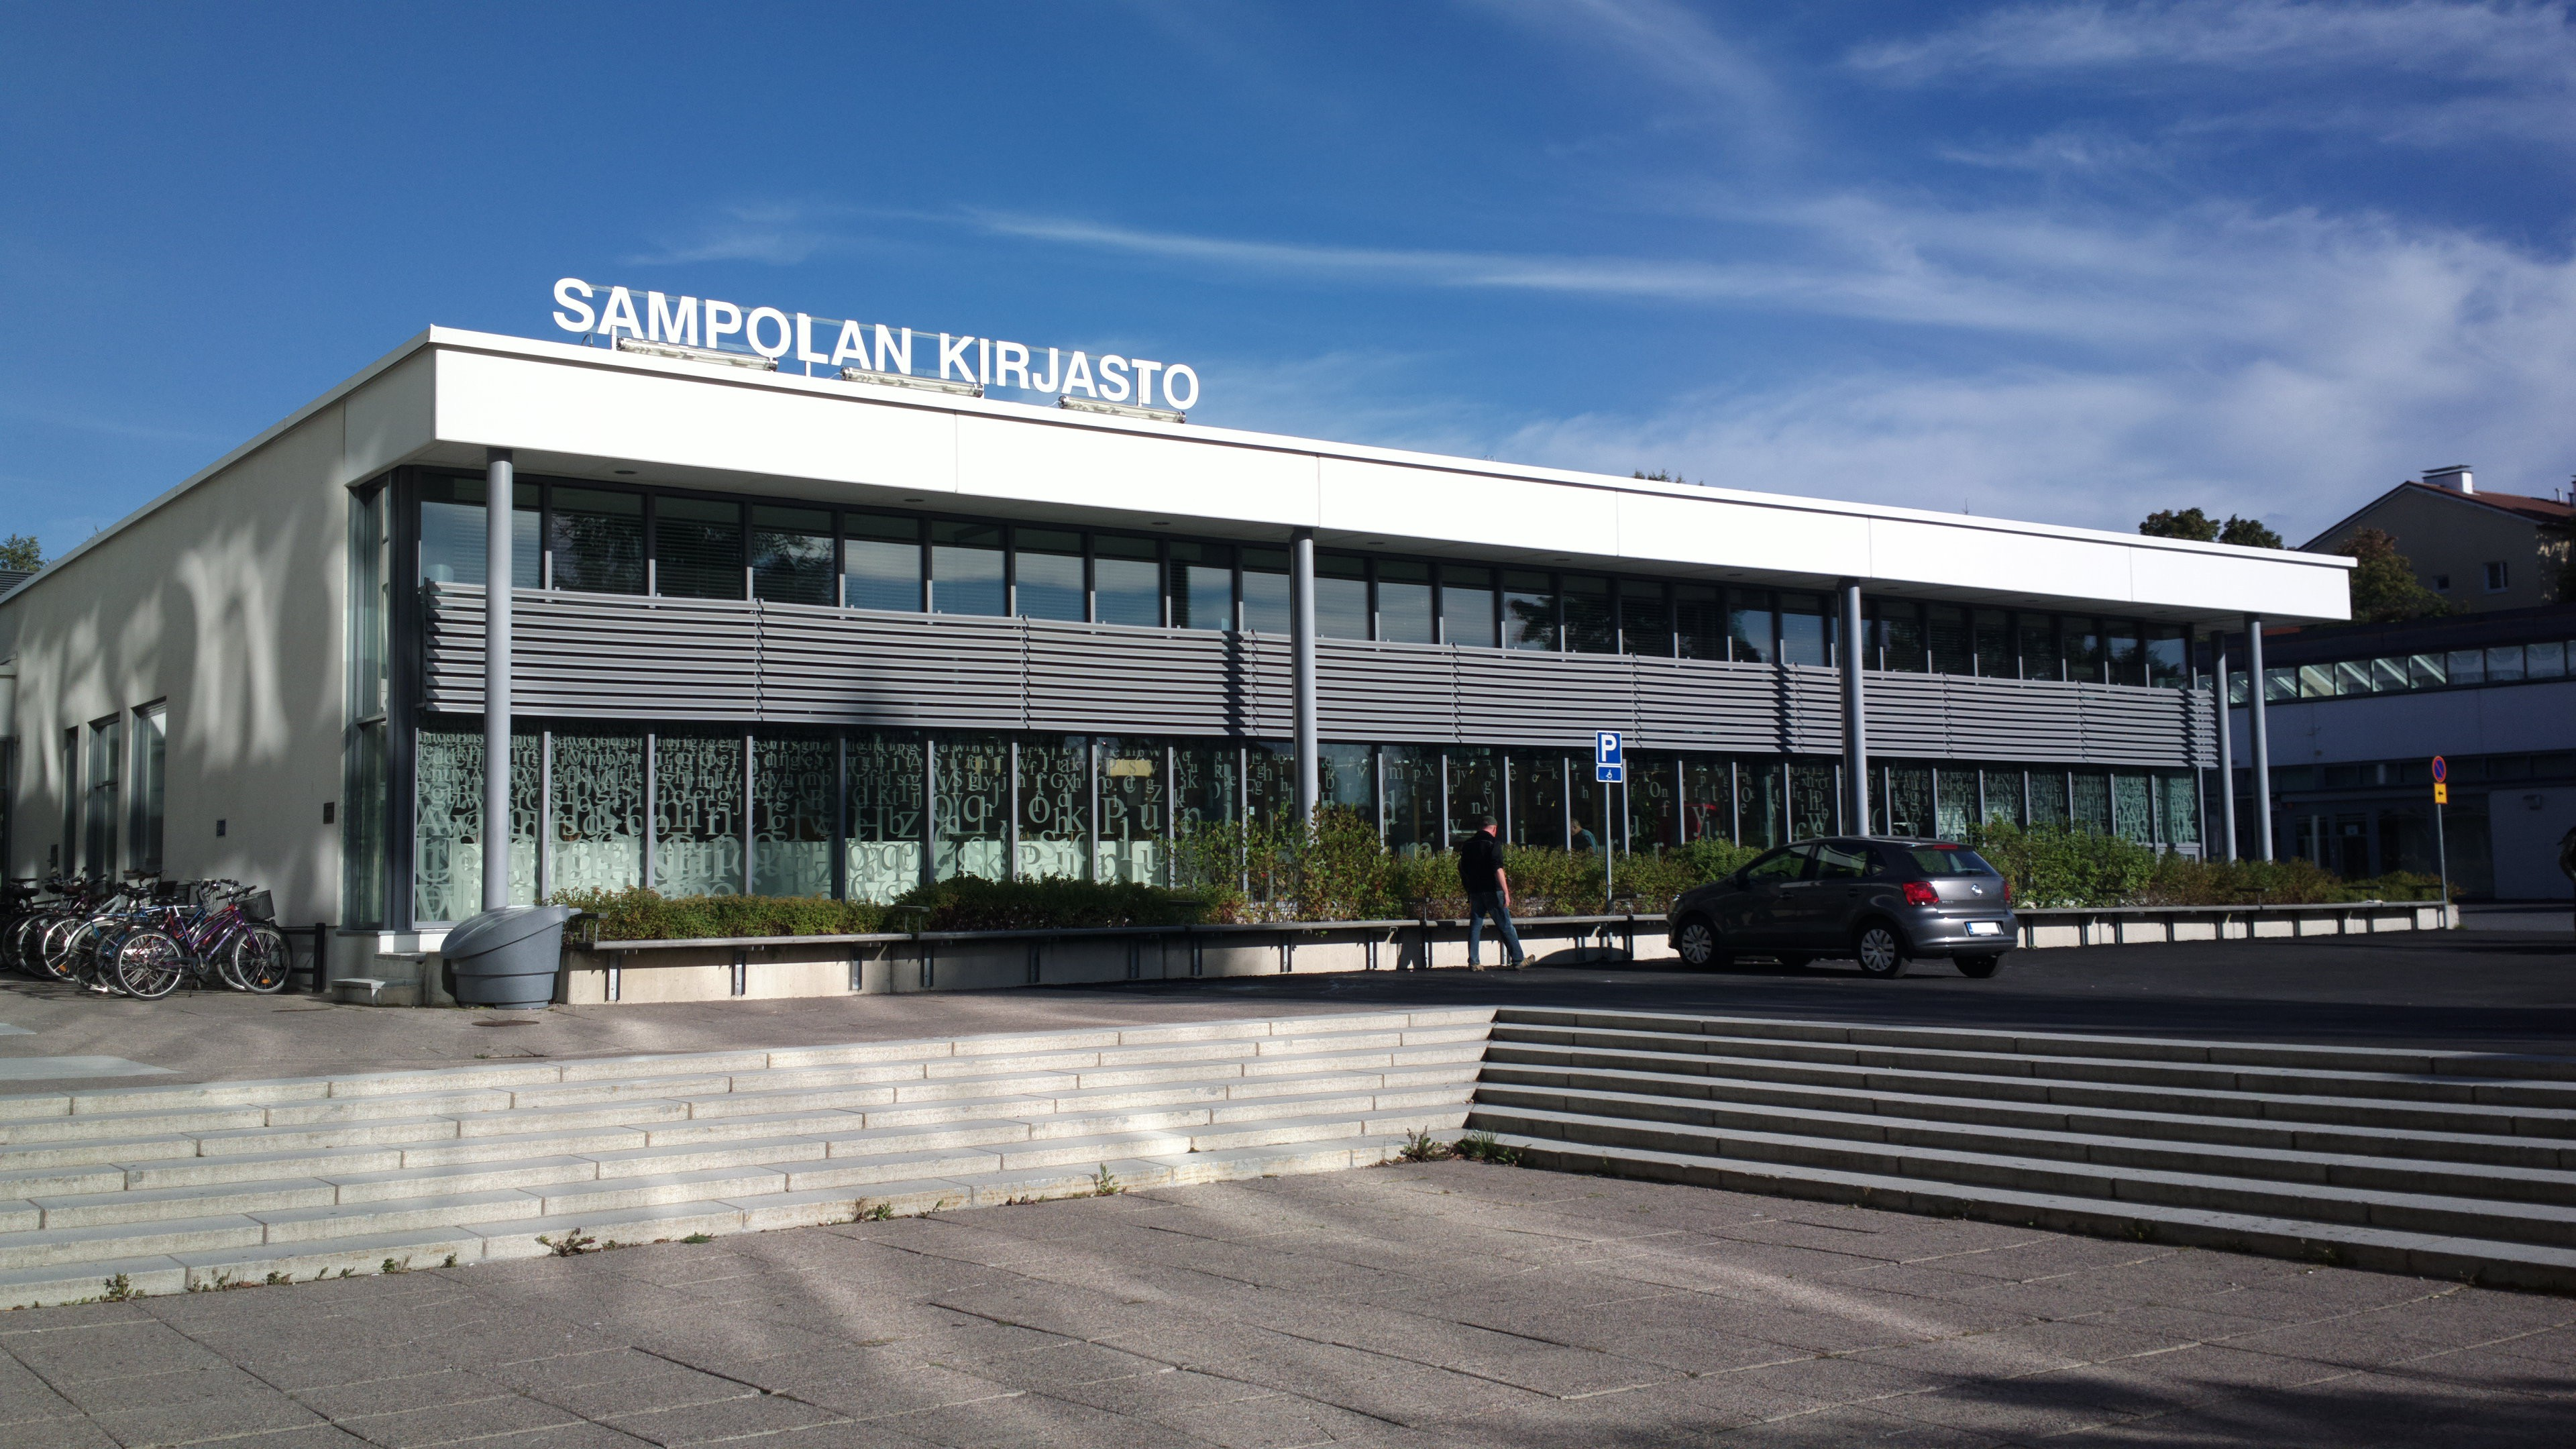 Sampolan kirjasto tietotori